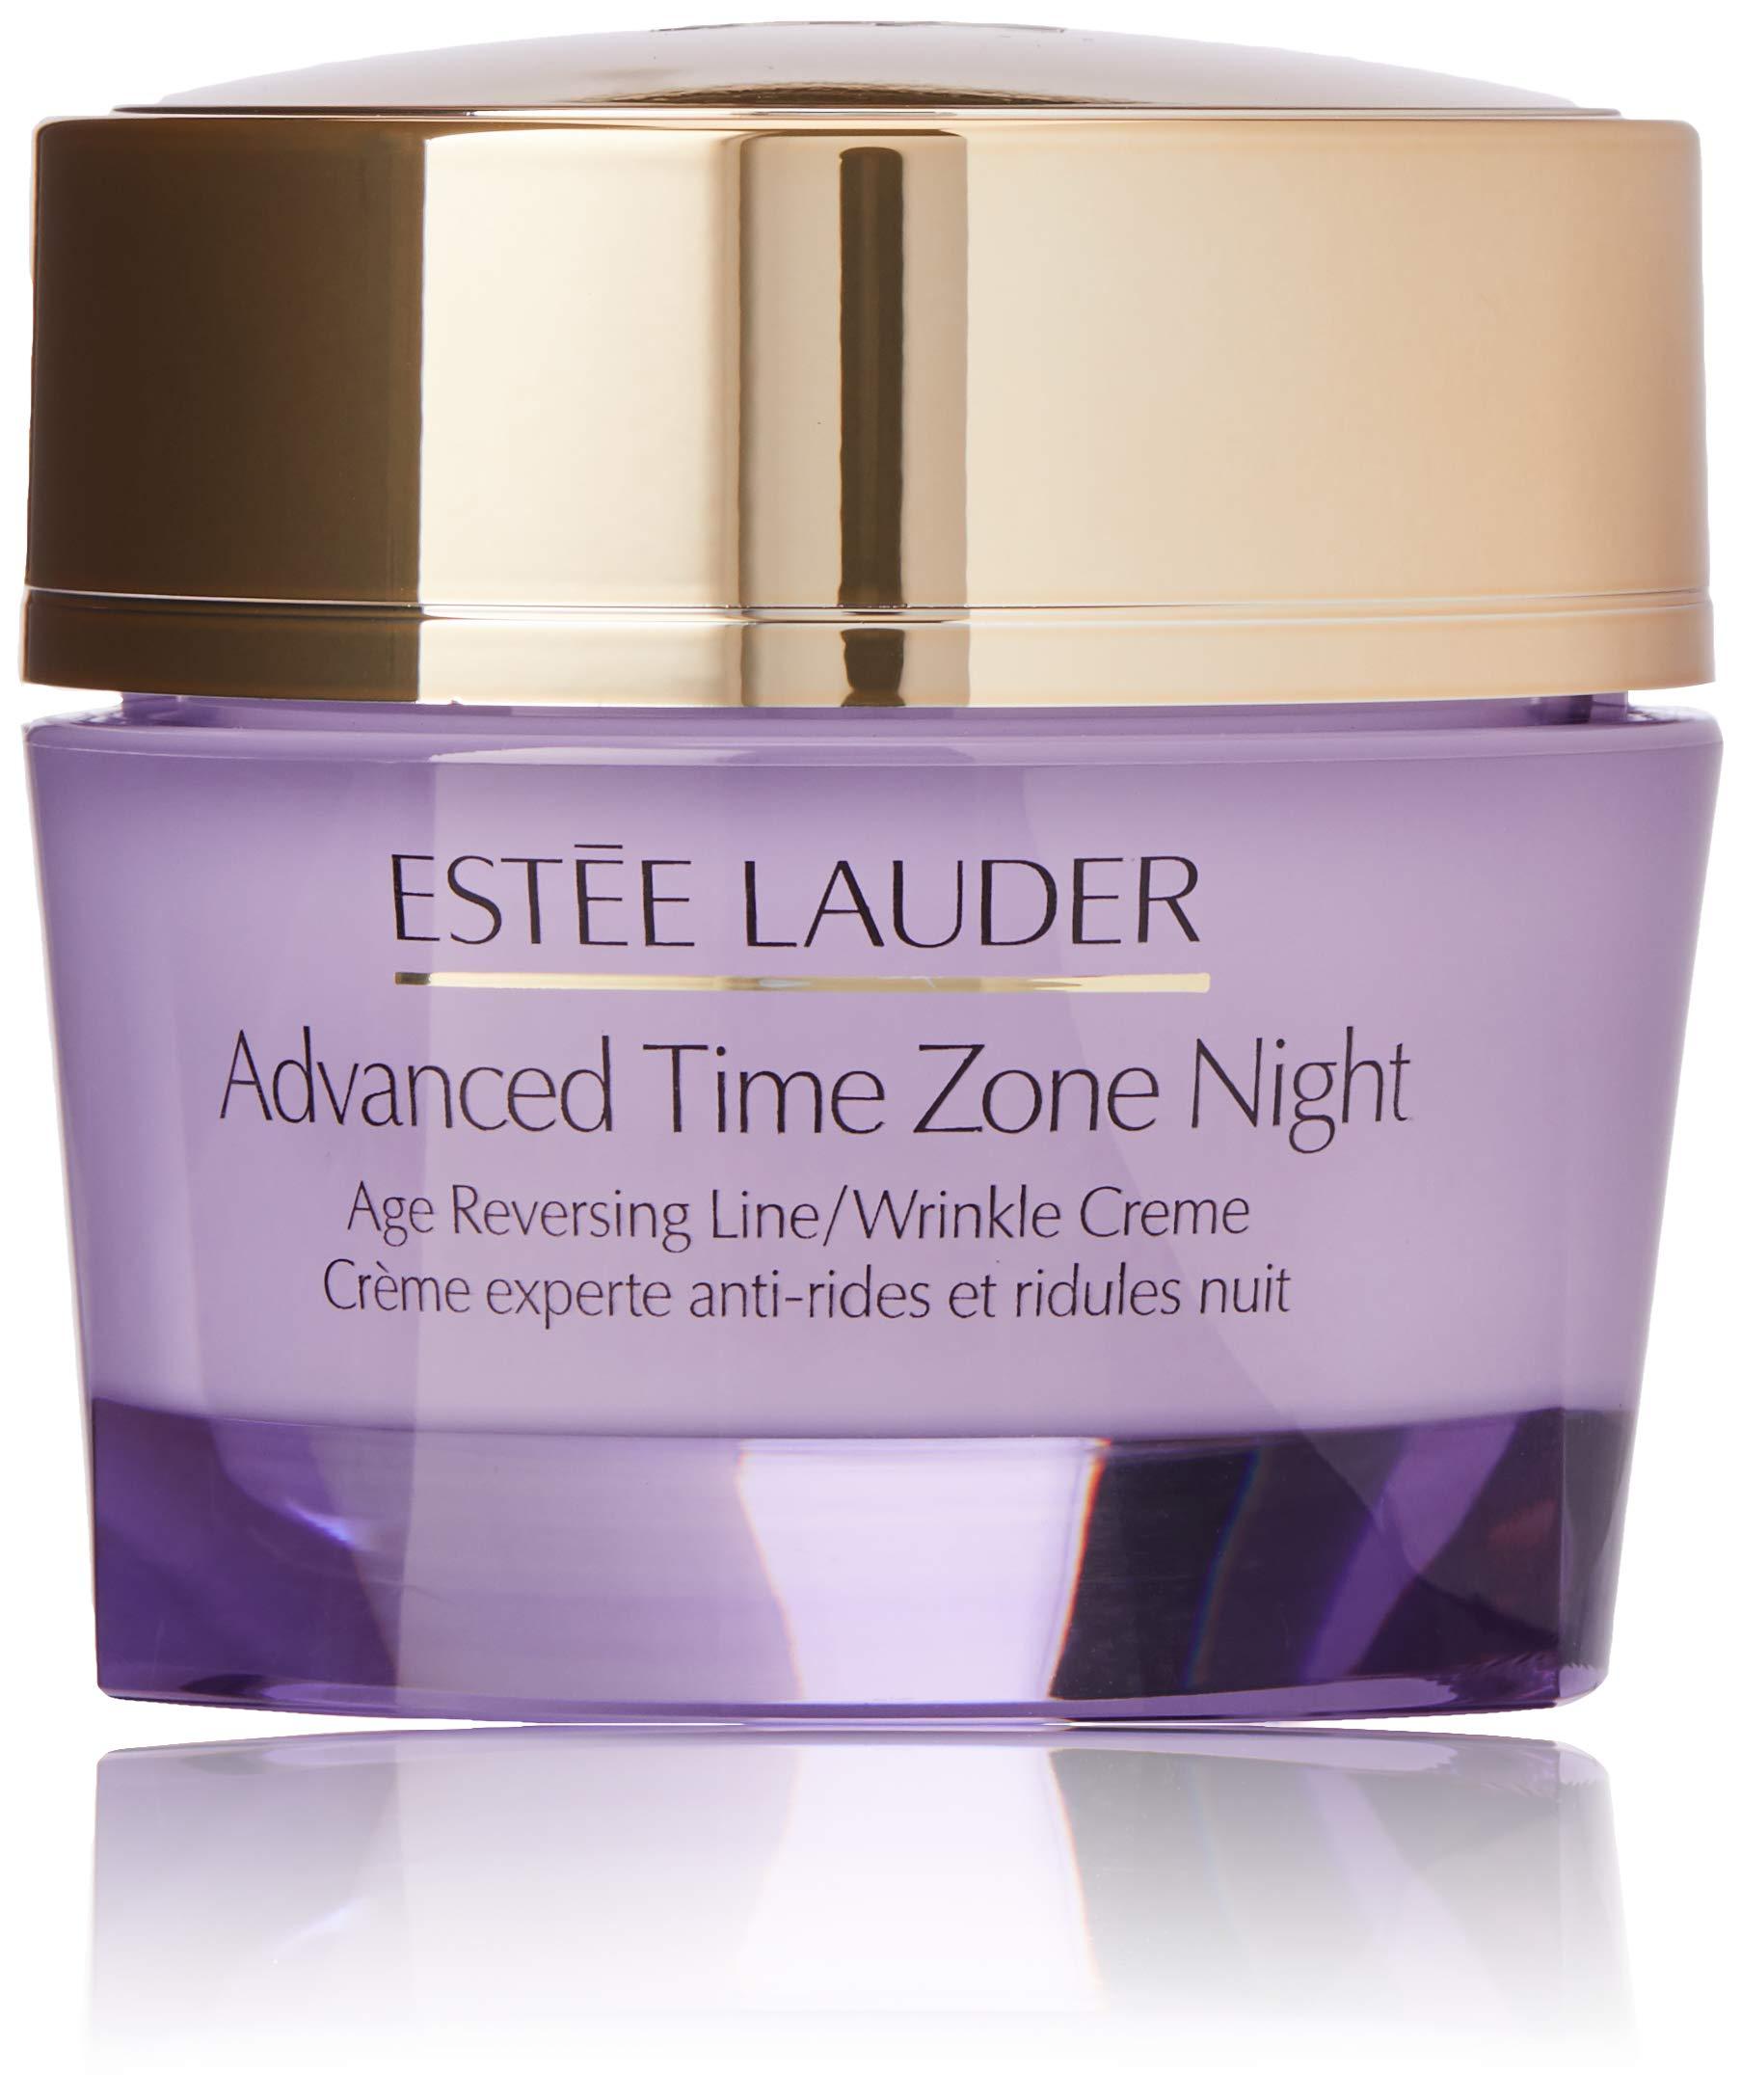 Estee Lauder Crema Antiarrugas de Noche – 50 ml